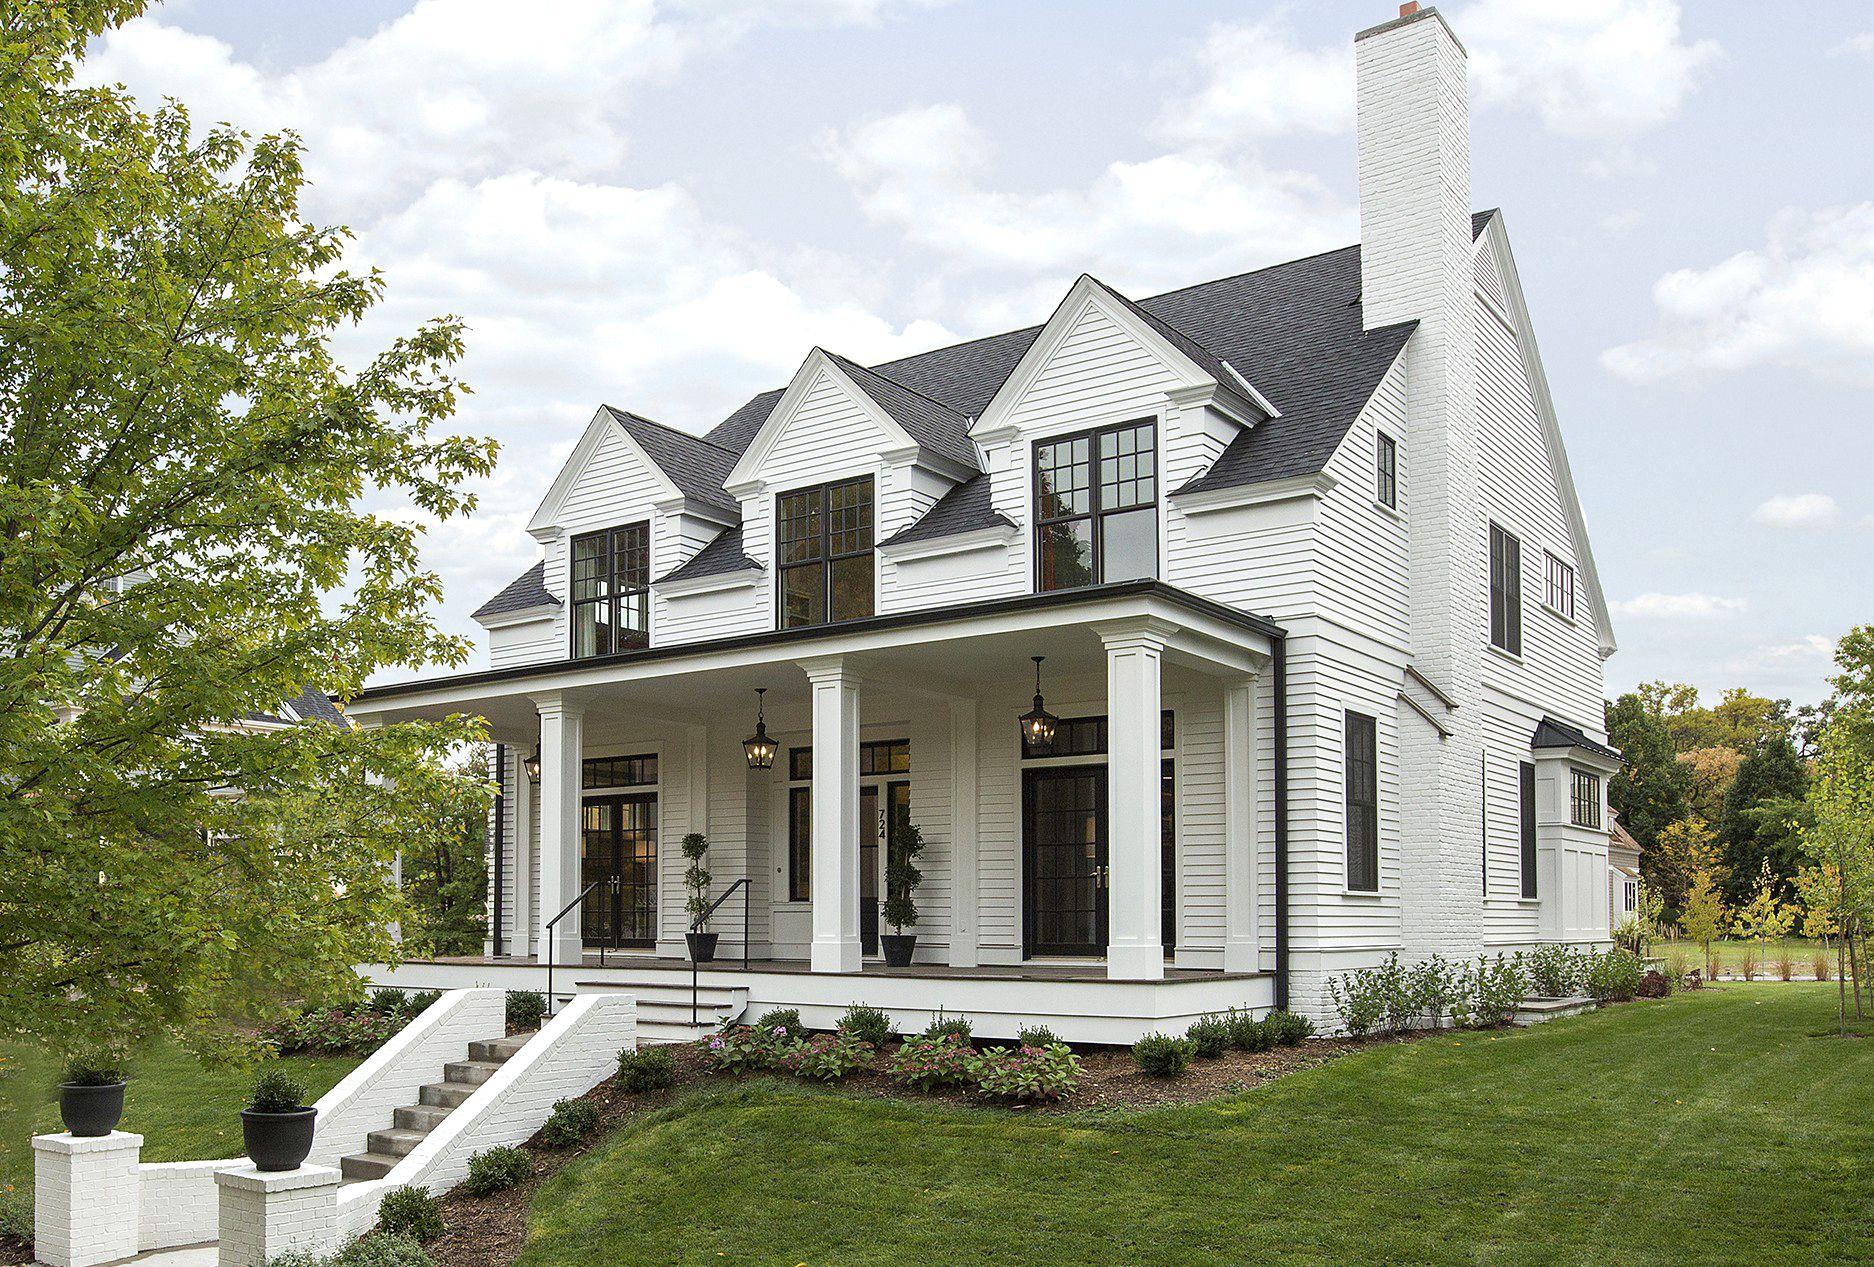 Modern Colonial Home Exterior Black Windows White House Columns White Exterior Houses Modern Farmhouse Exterior Exterior House Colors